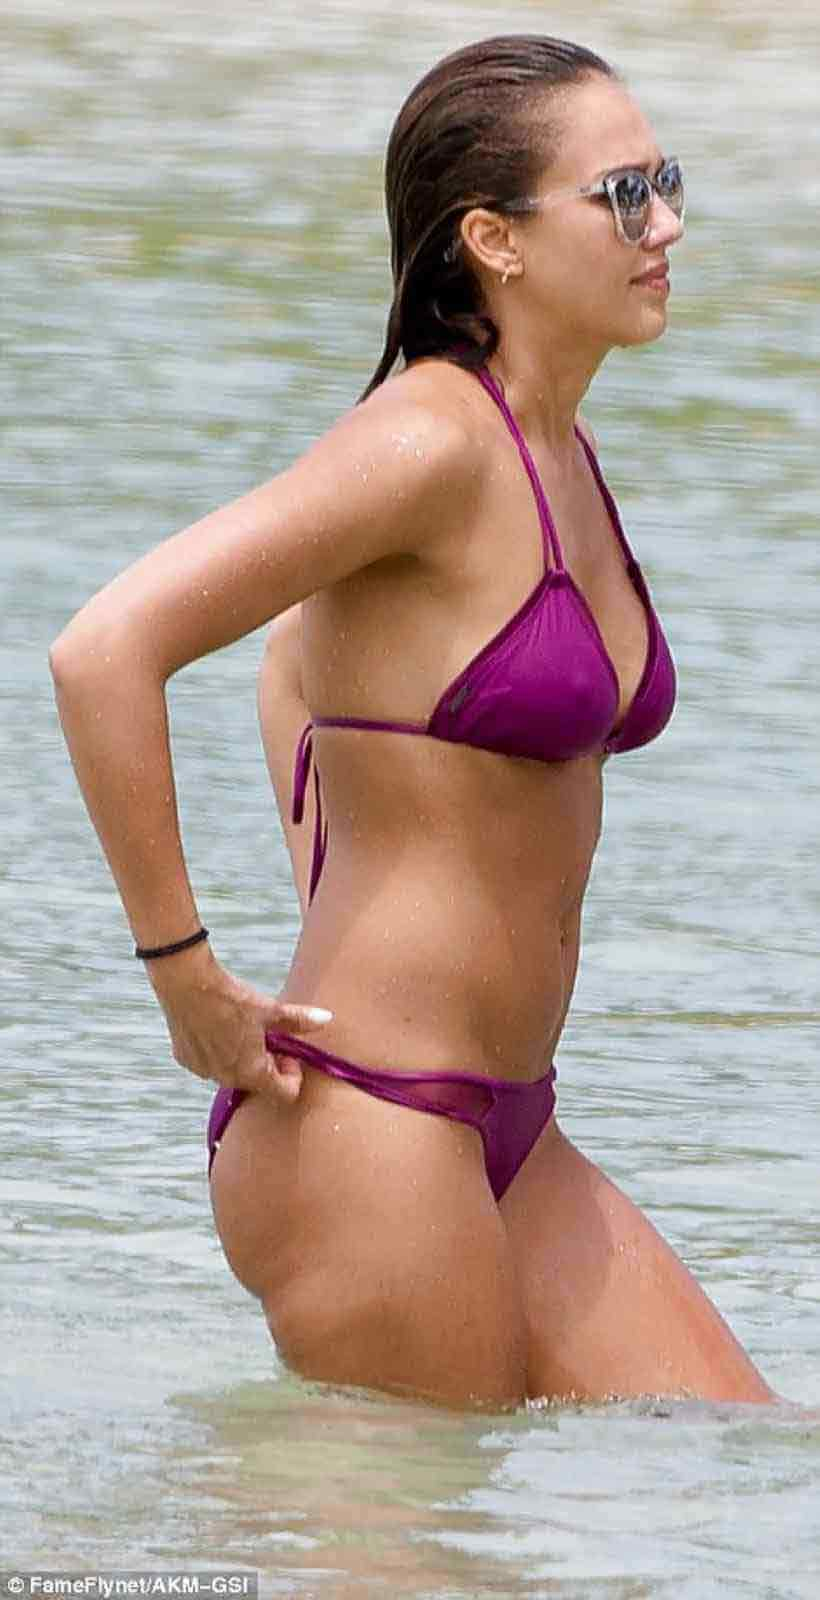 jessica-alba-wet-pokies-charming-sexy-photo-in-swimsuit-baithing-suit-pictures-of-jessica-alba